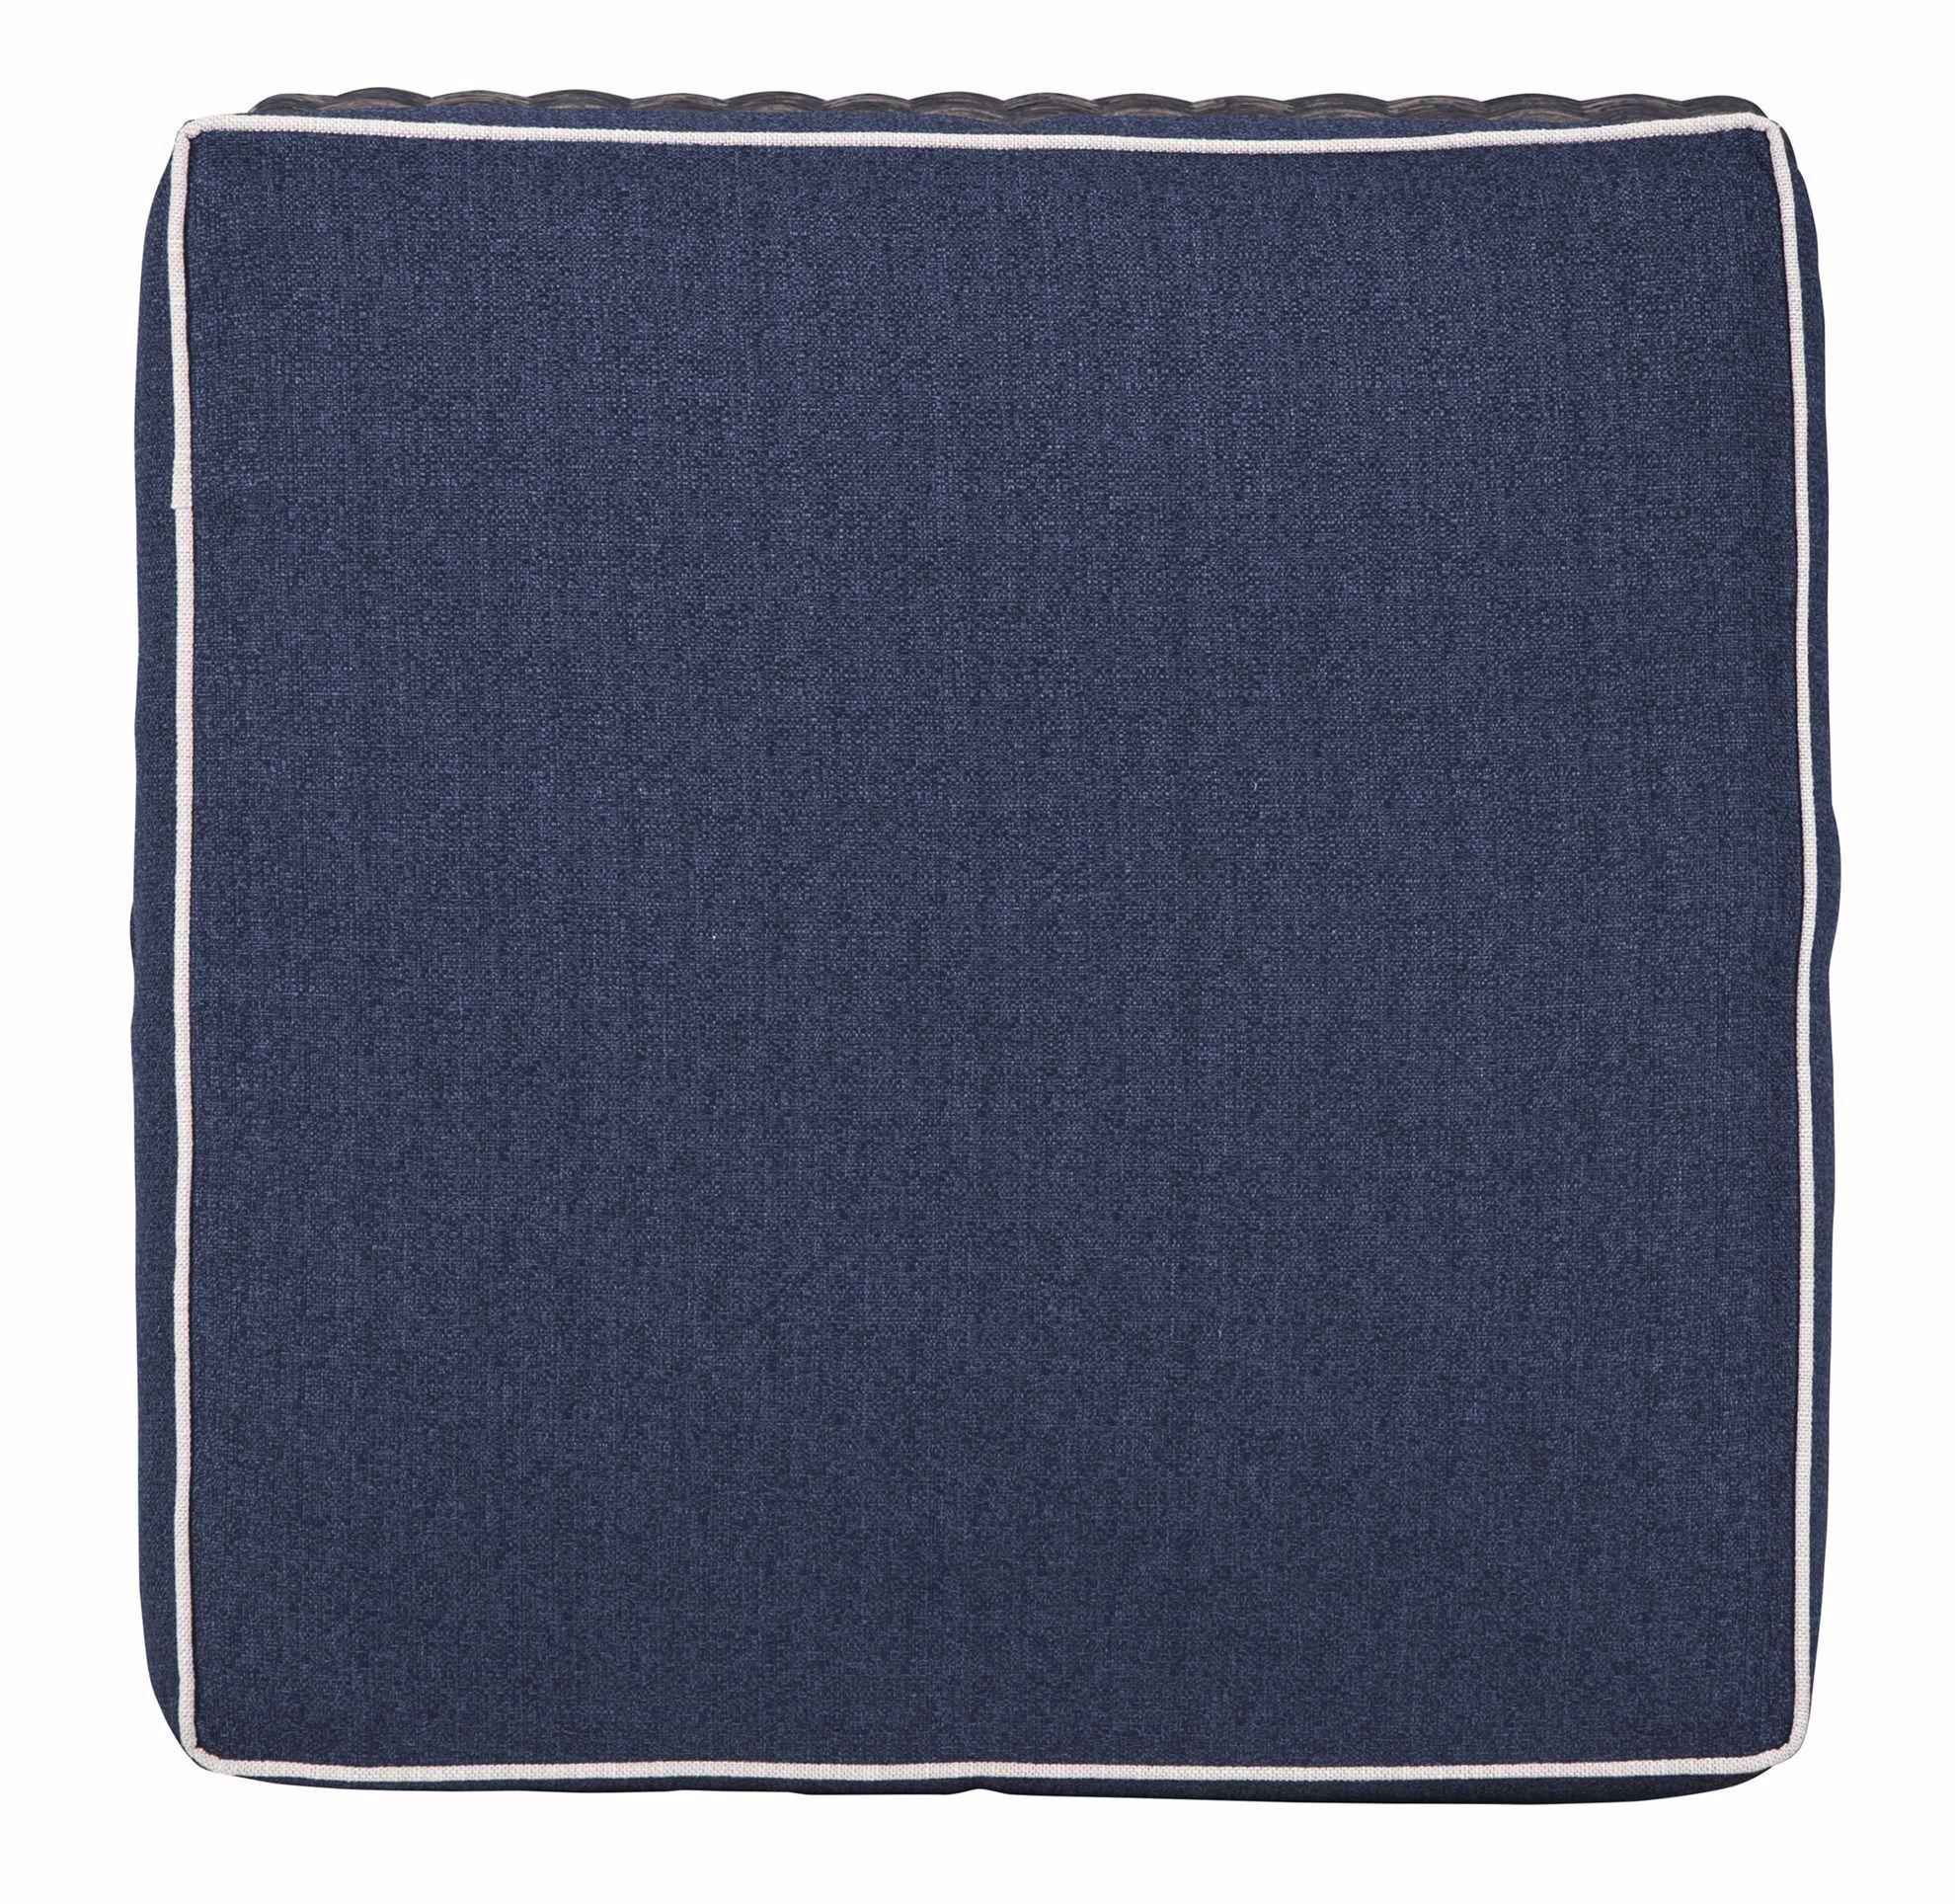 Picture of Grasson Lane Cushion Ottoman